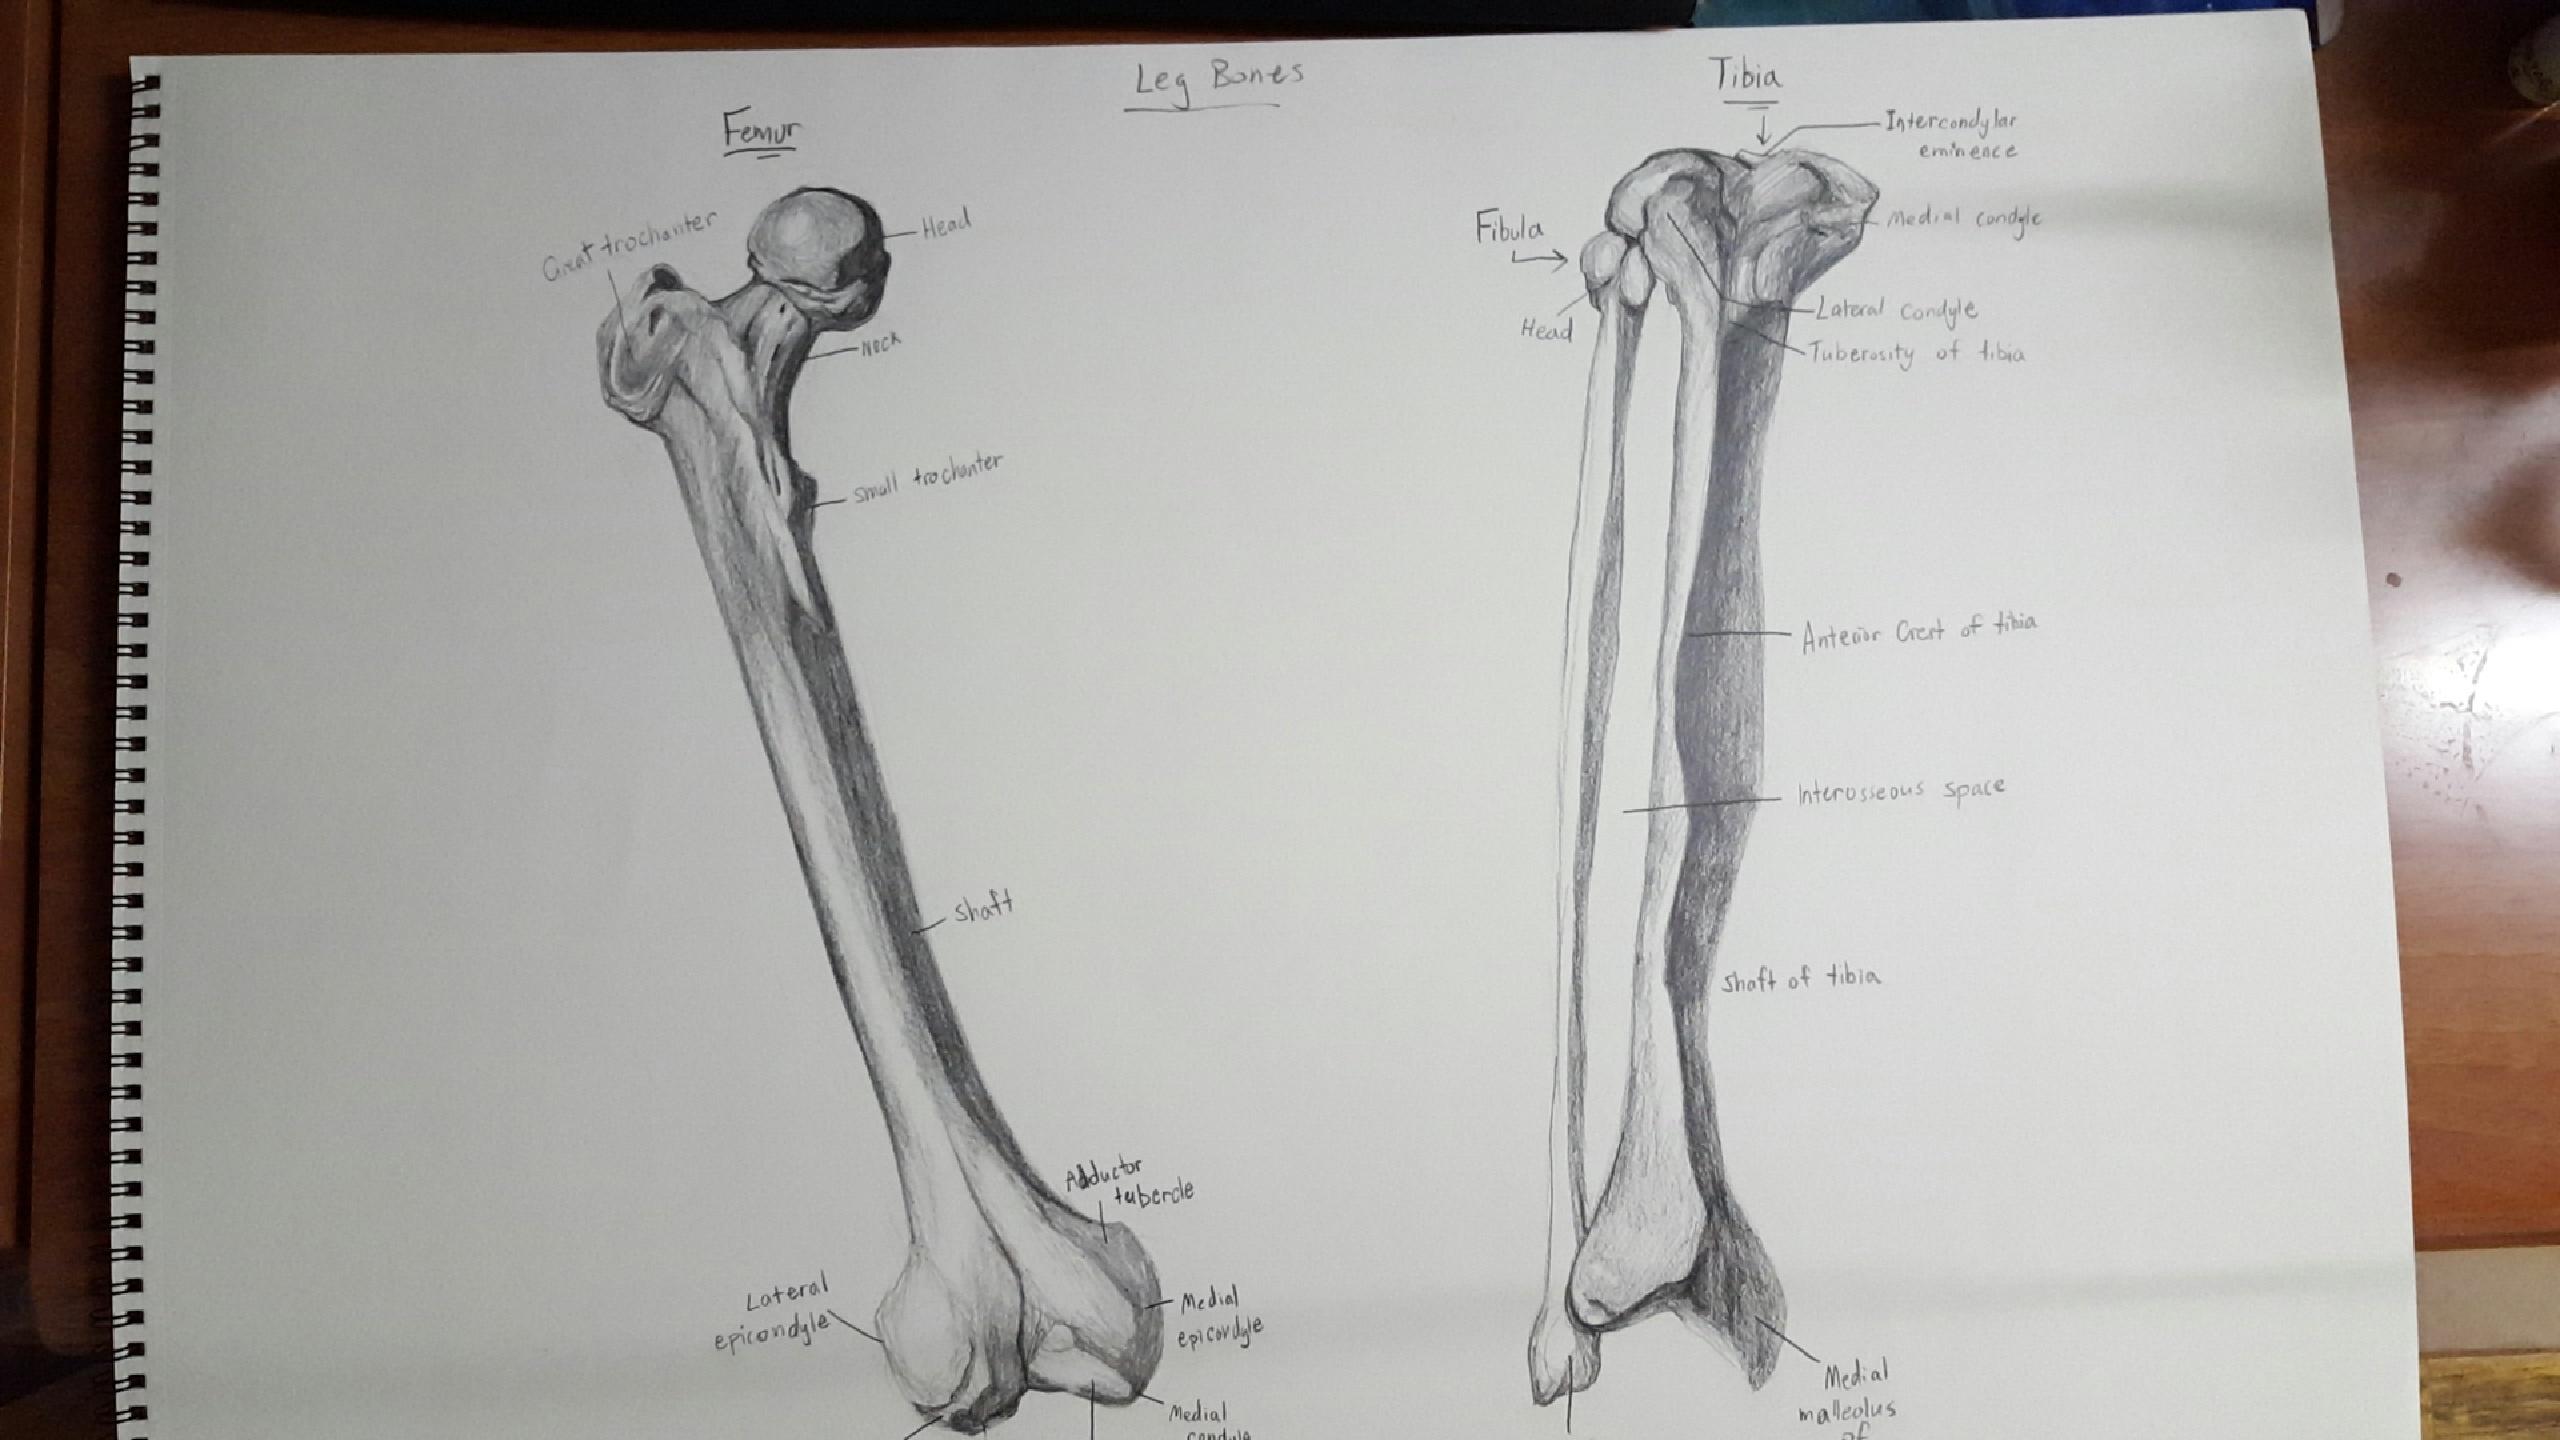 Human anatomy homework help Top Rated Tutors